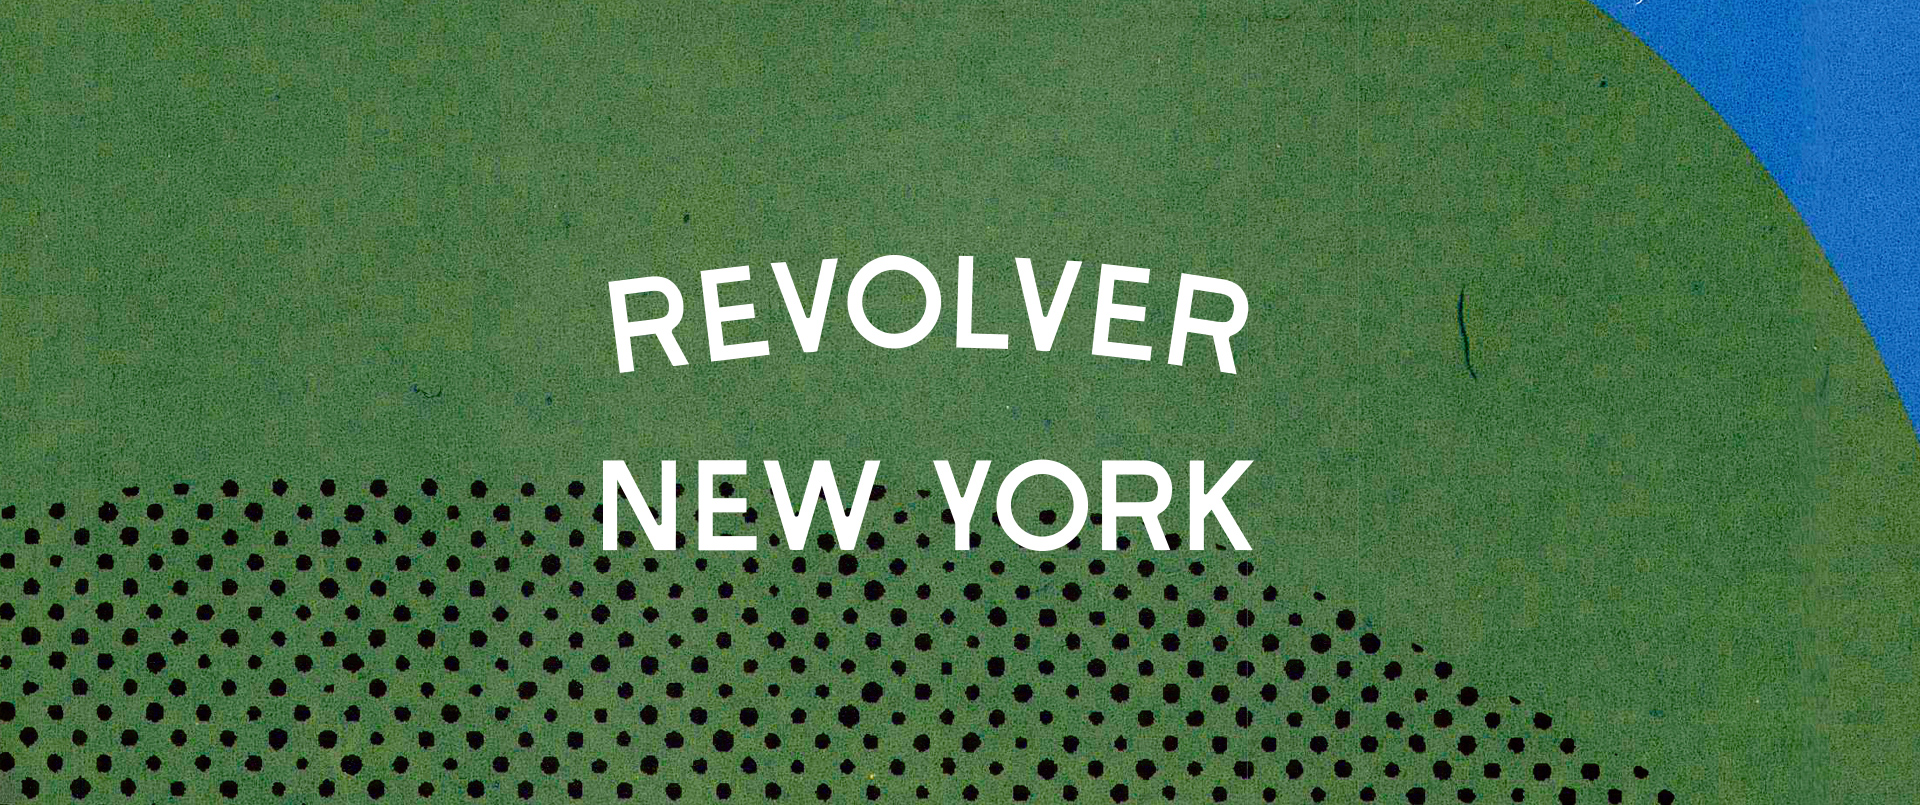 Revolver New York